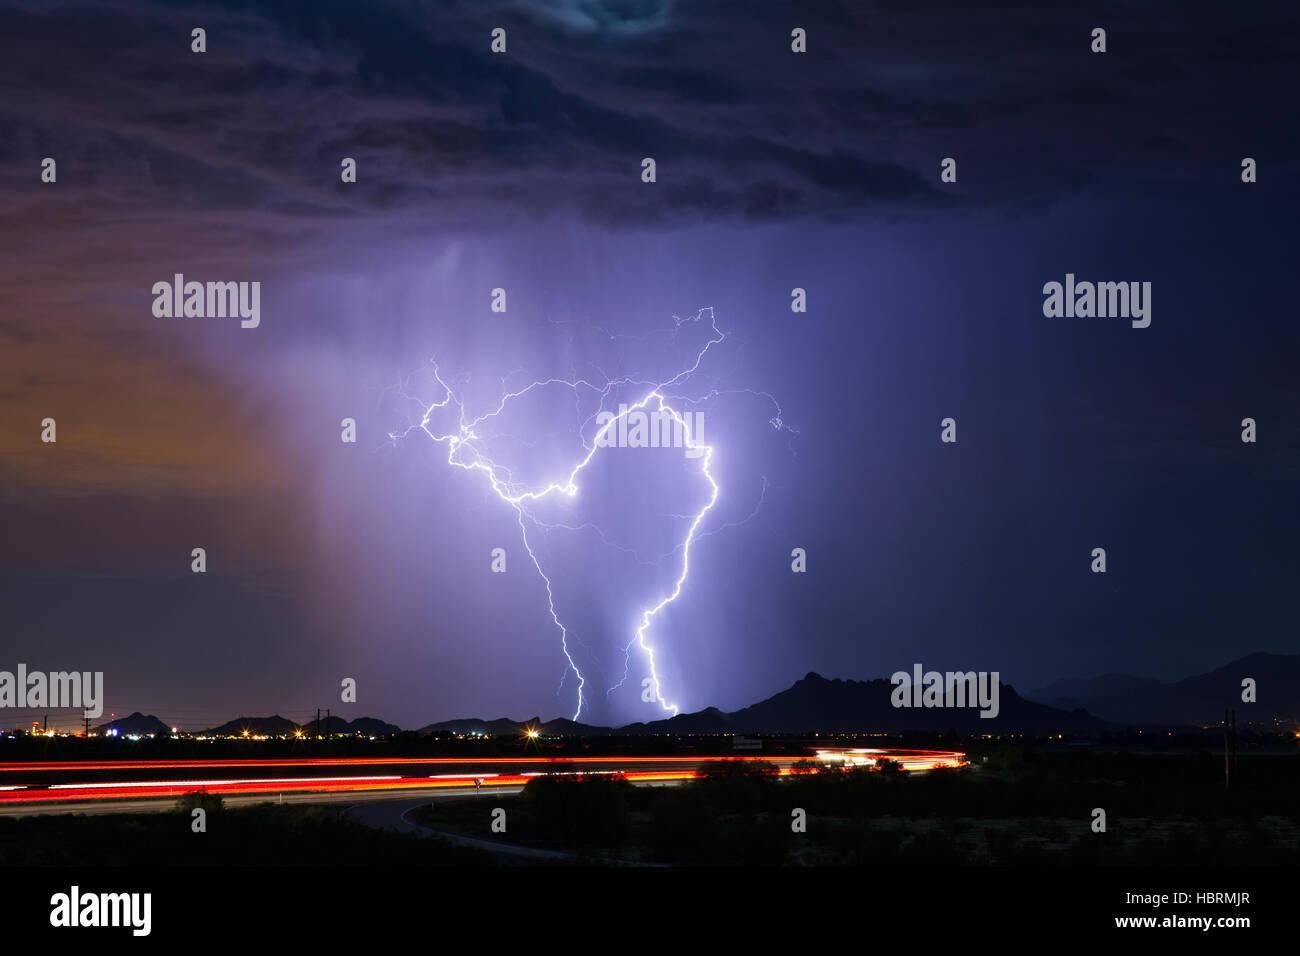 lightning during a monsoon thunderstorm in tucson arizona stock